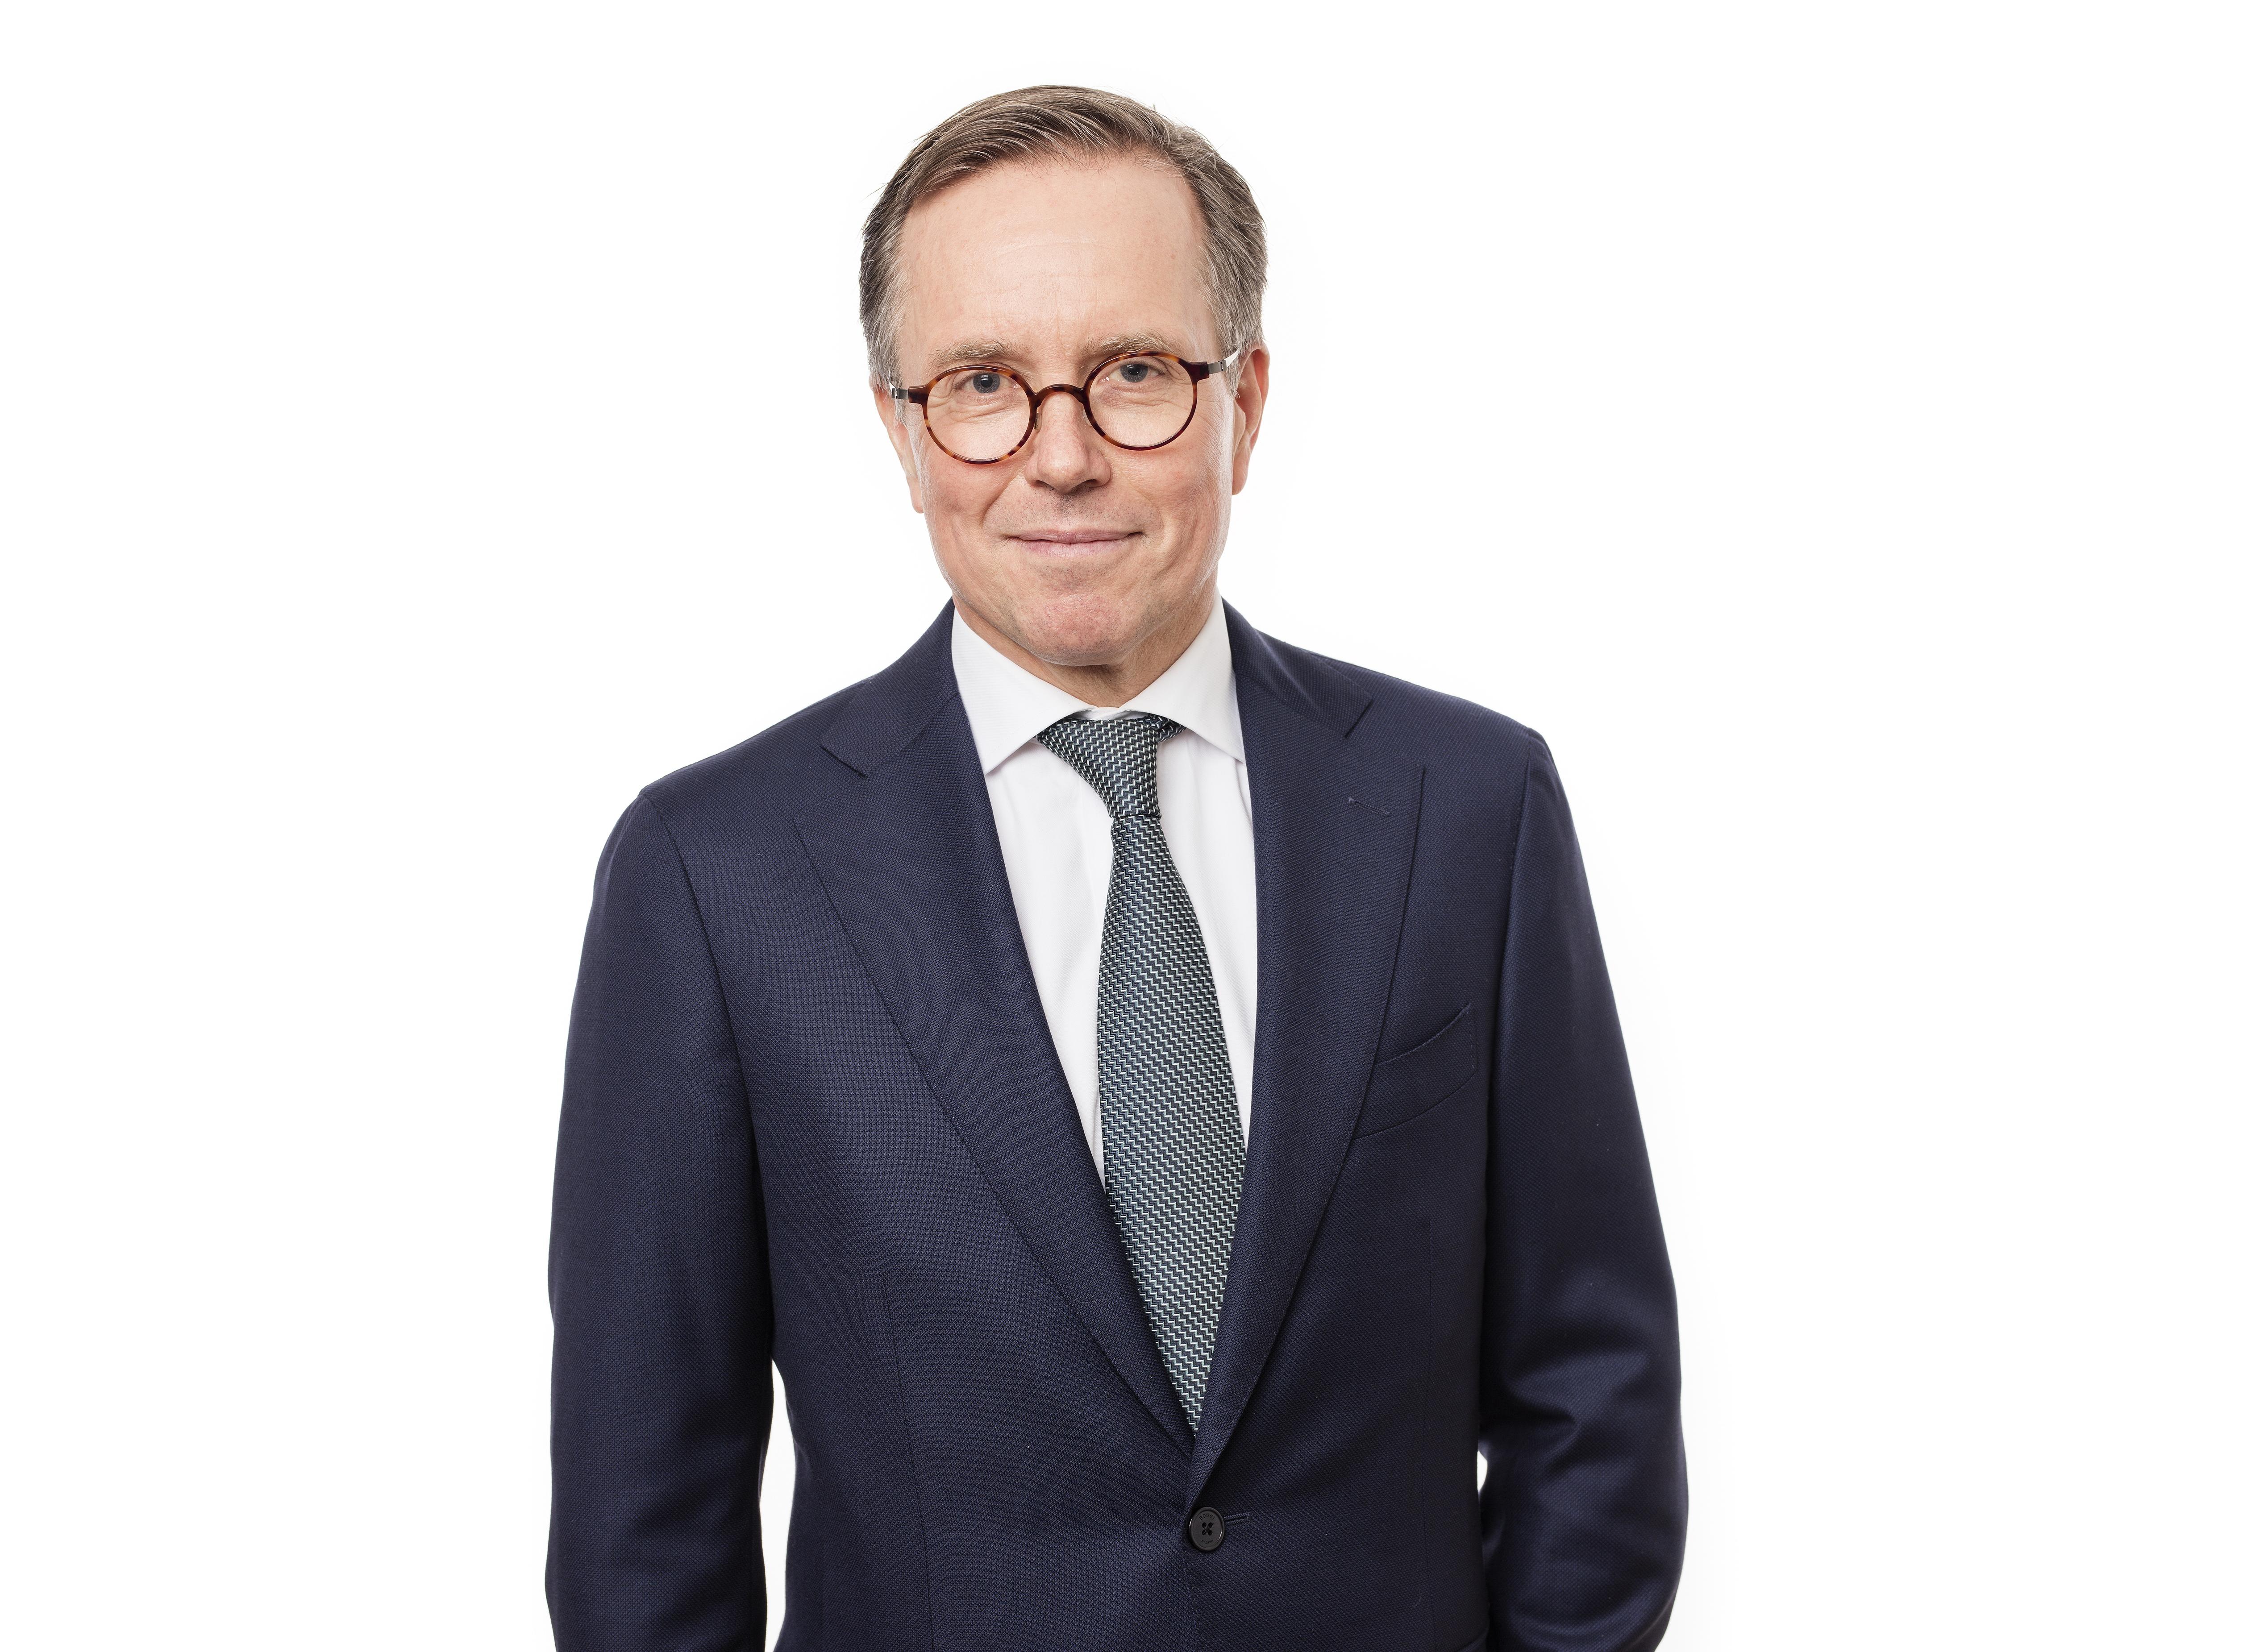 Mats Torstendahl